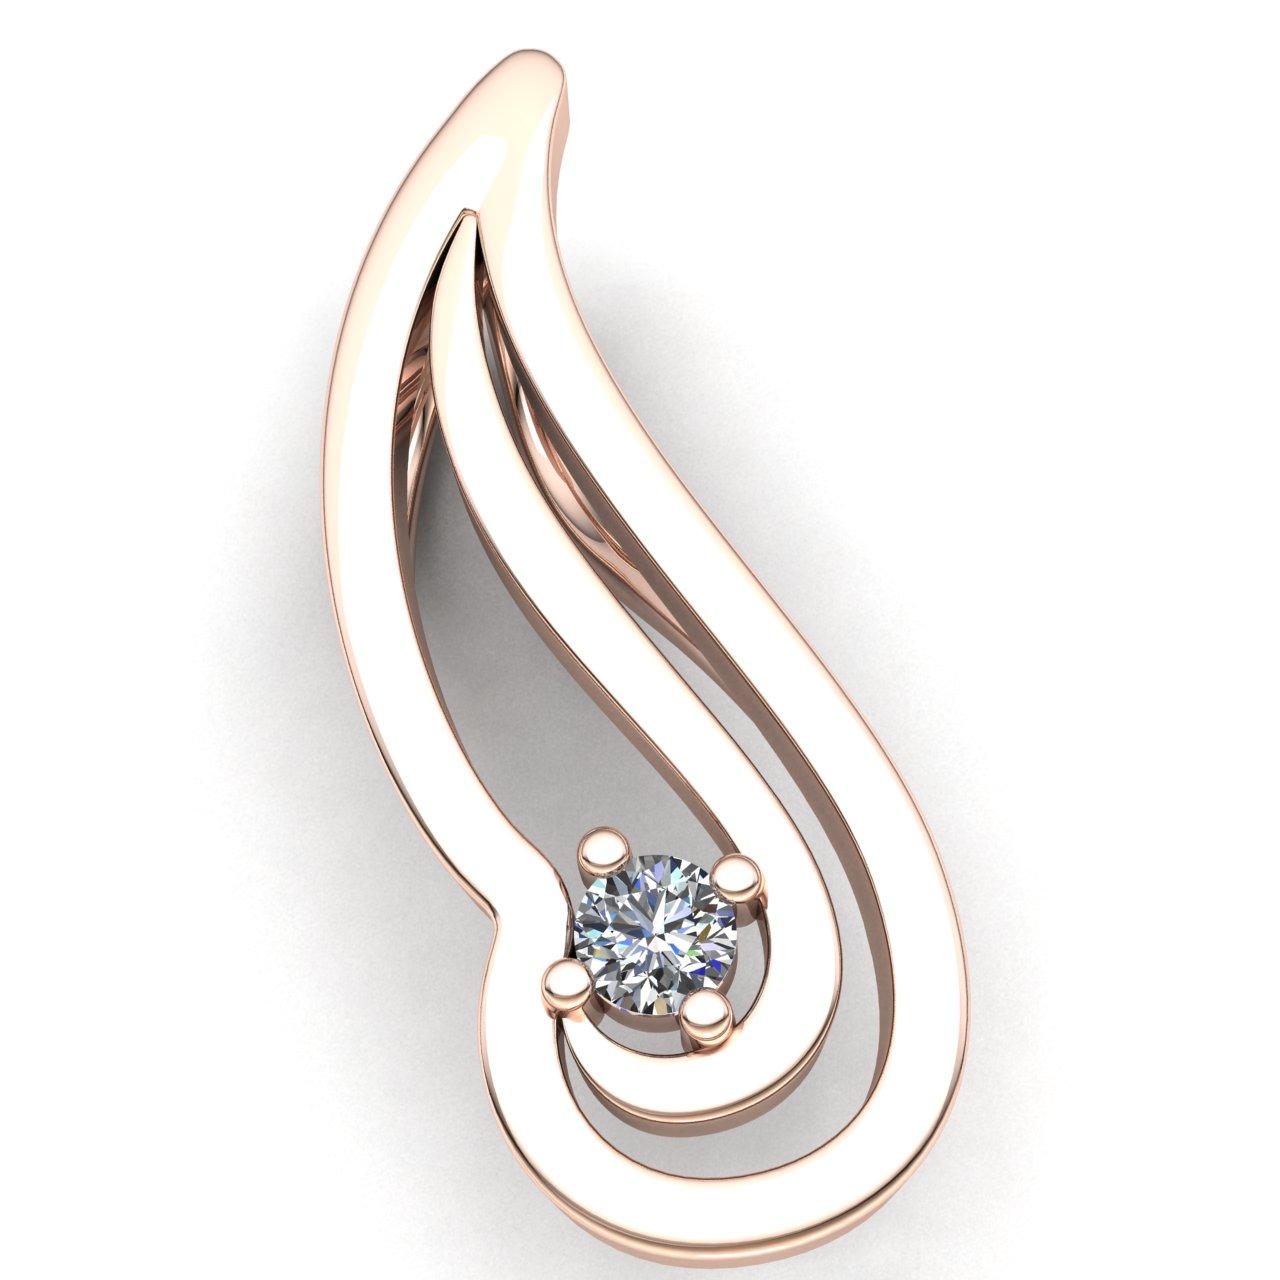 Genuine 025ctw round cut diamond ladies forever one promise pendant genuine 0 25ctw round cut diamond ladies forever aloadofball Choice Image